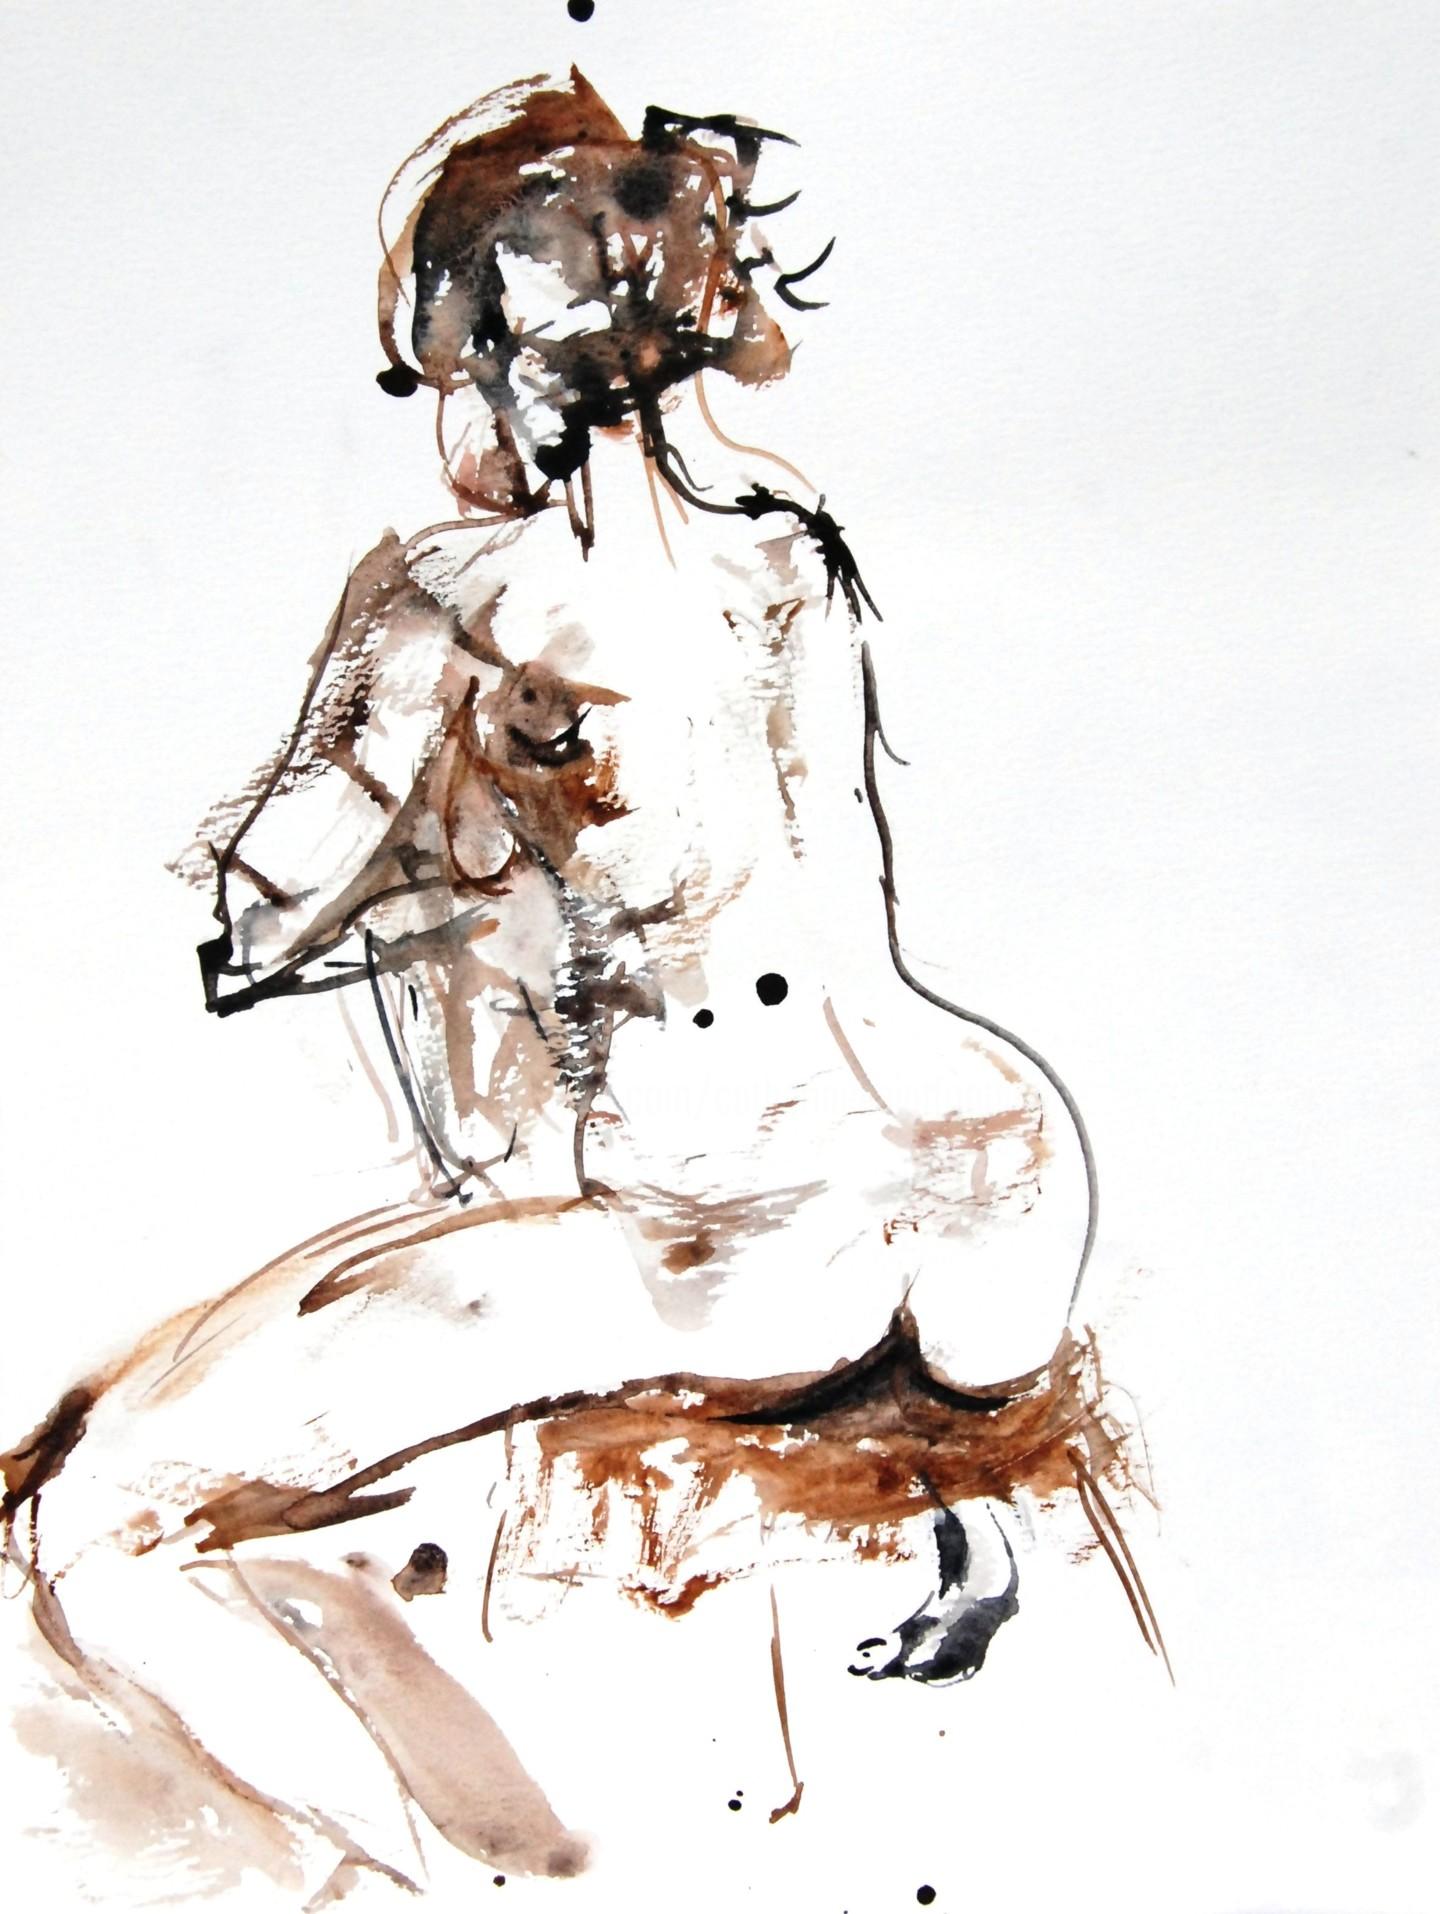 Catherinesaintfontaine - nu femme assise de dos